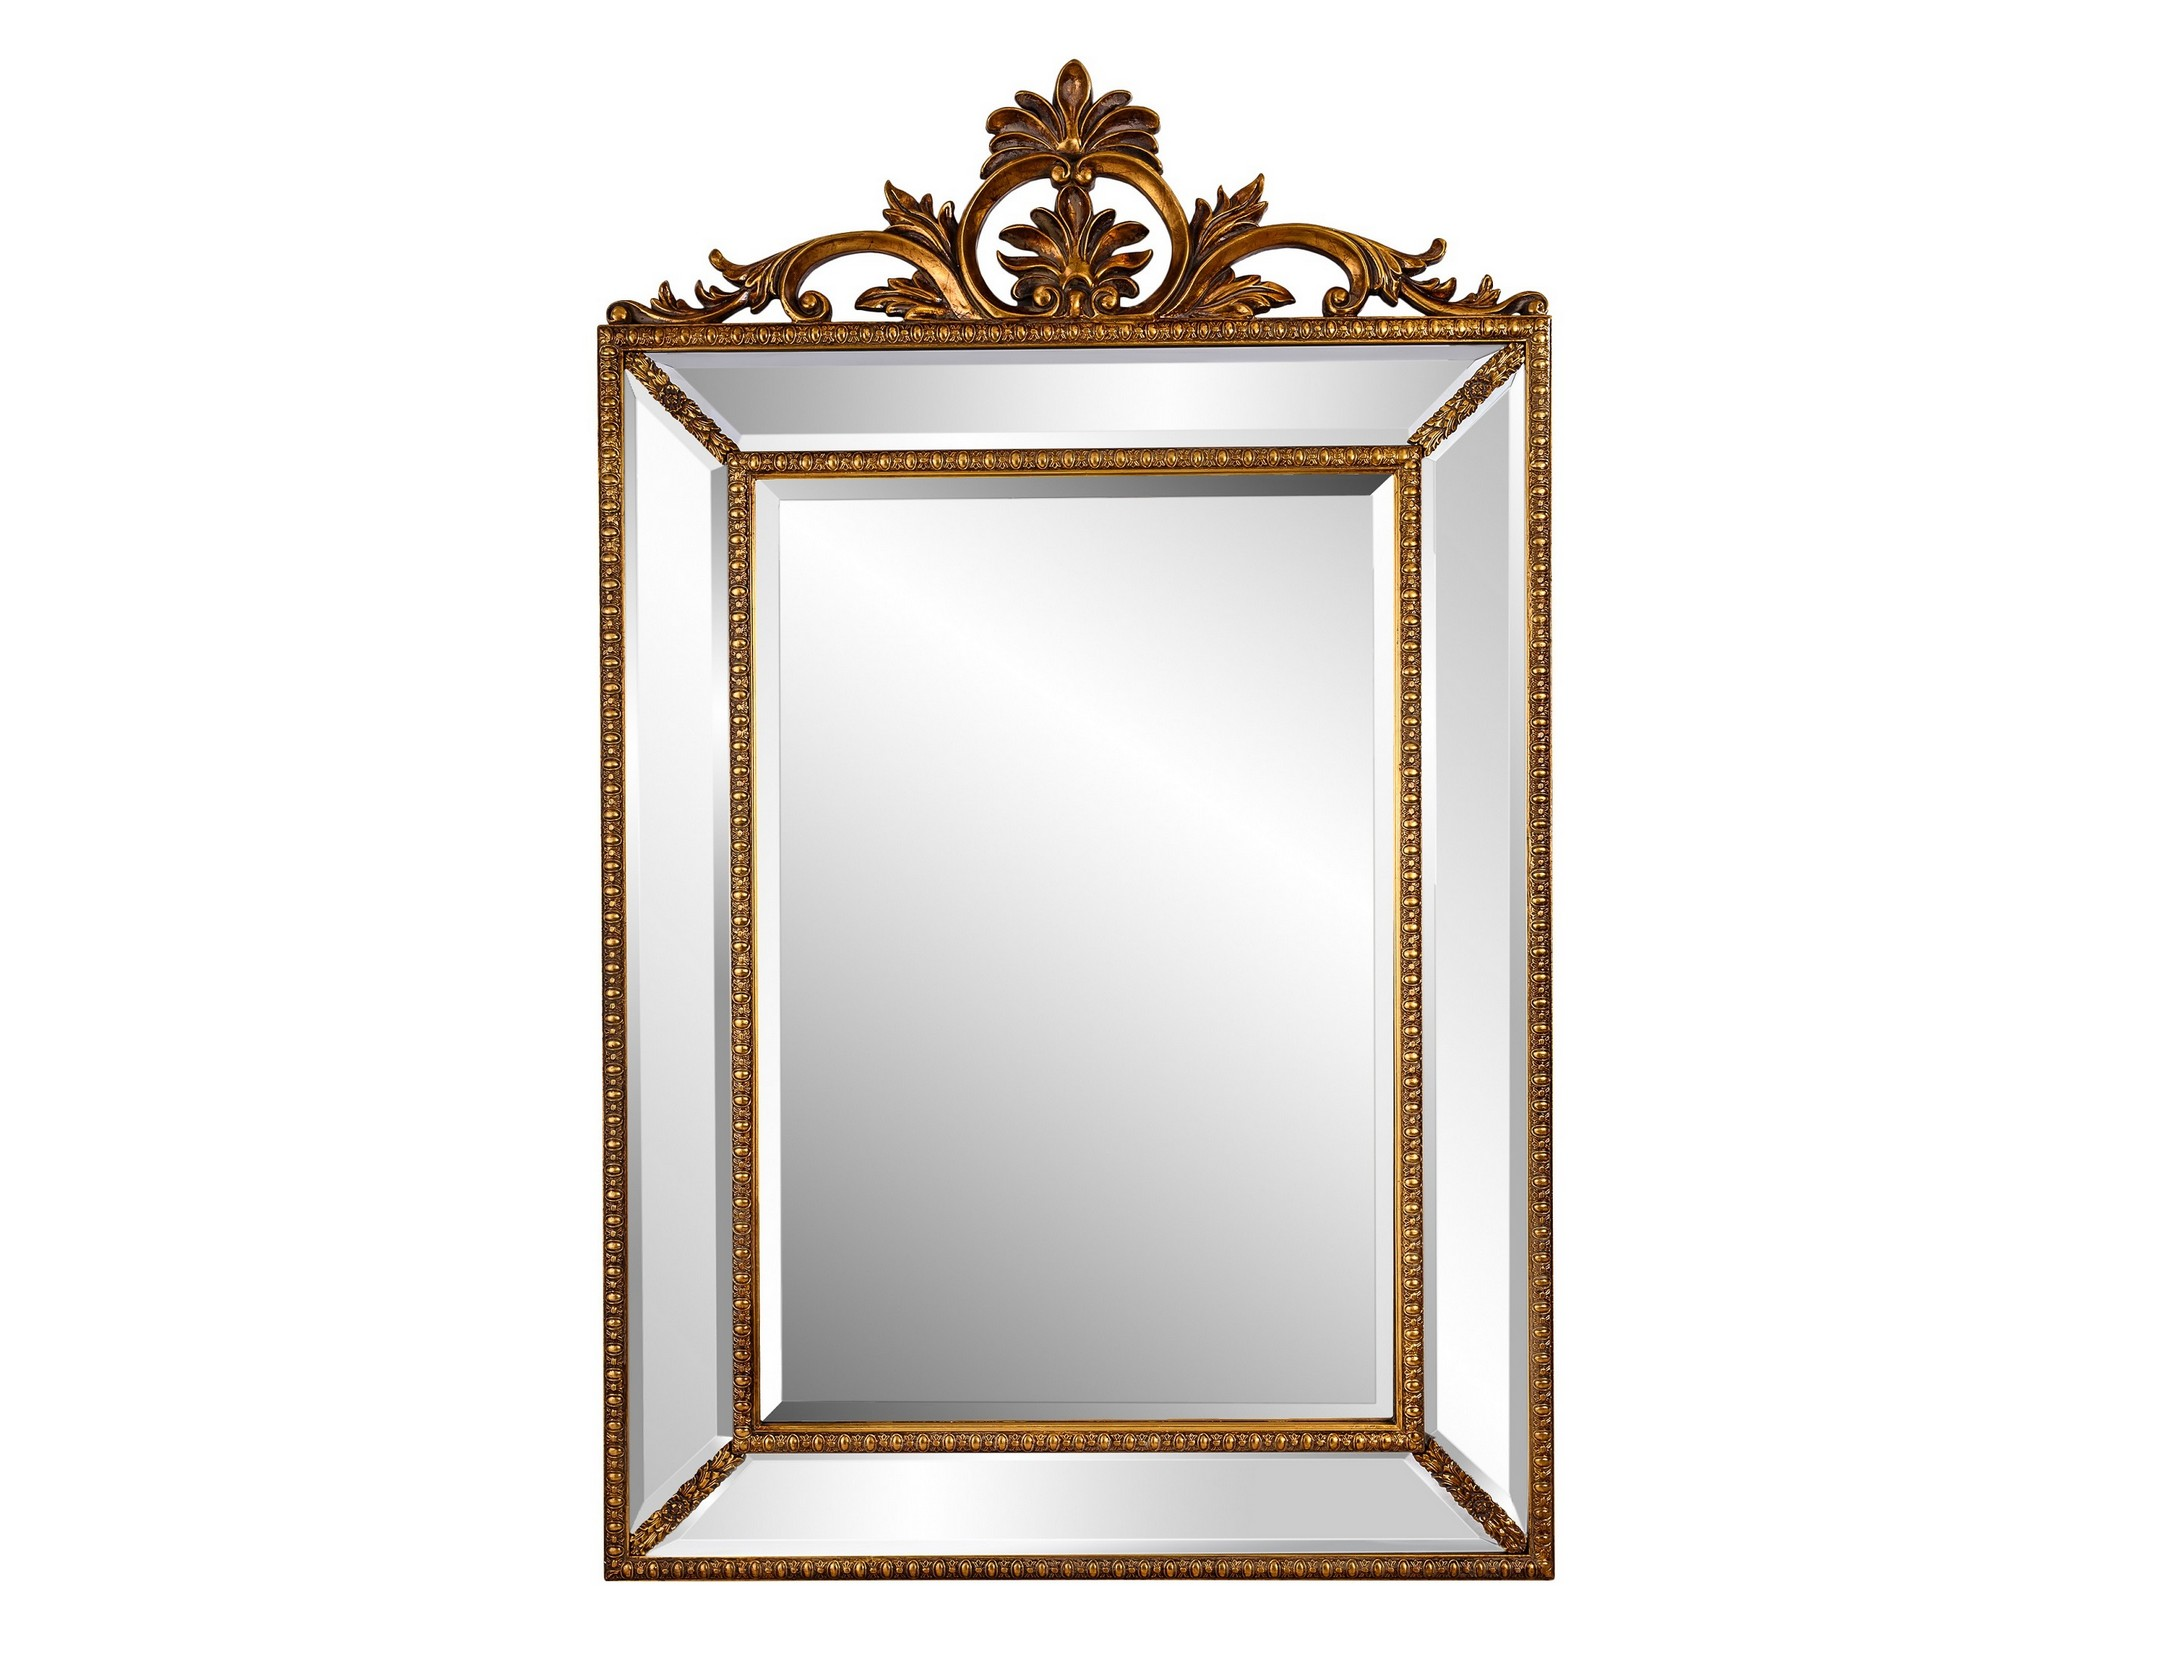 Зеркало Ambren GoldНастенные зеркала<br>Цвет: античное золото<br><br>Material: Дерево<br>Length см: None<br>Width см: 90.0<br>Depth см: None<br>Height см: 144.0<br>Diameter см: None